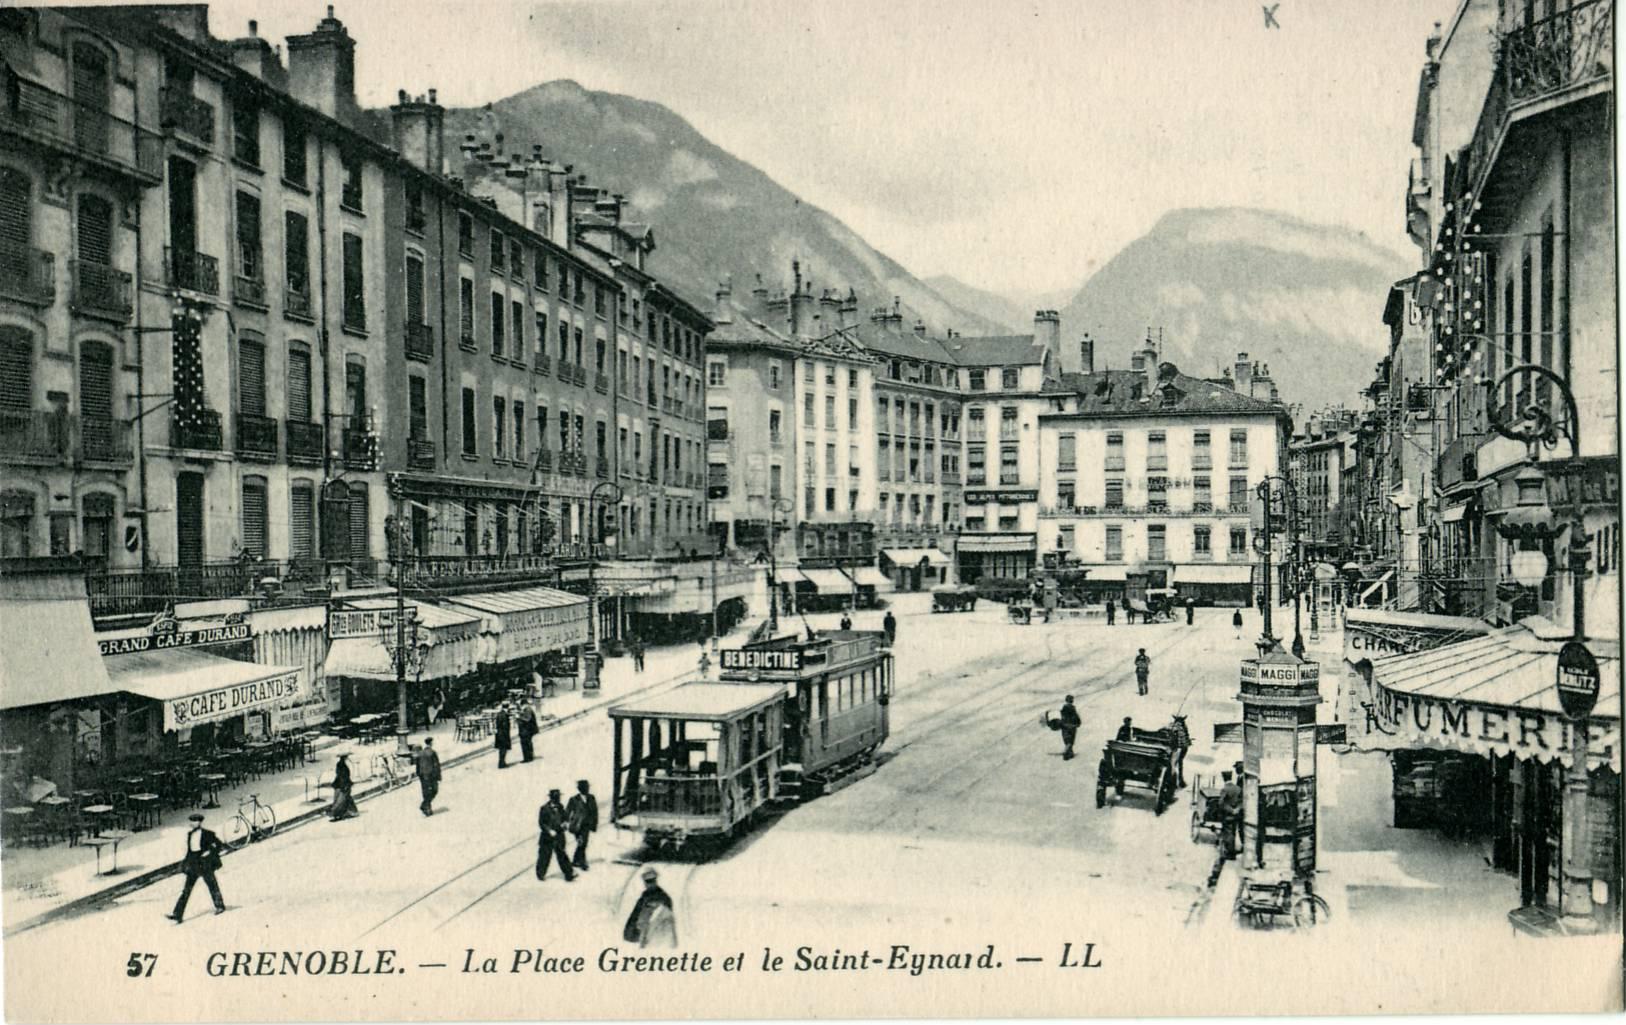 Ancien tramway de grenoble for Restaurant la cuisine grenoble